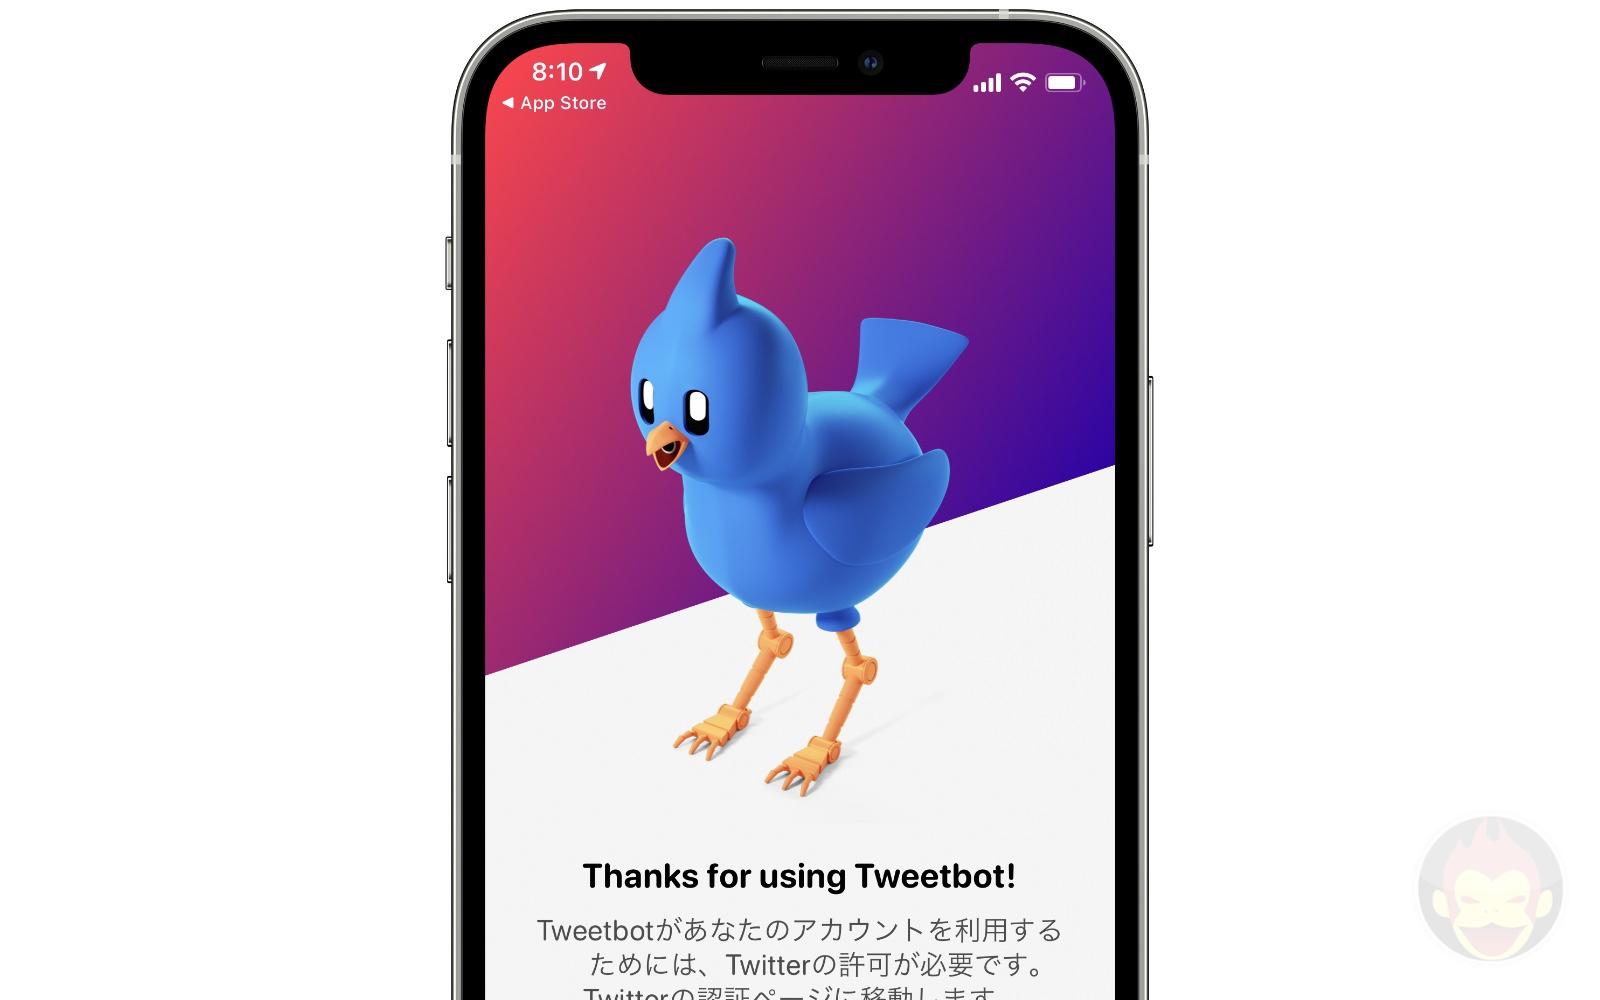 Thanks for using tweetbot6